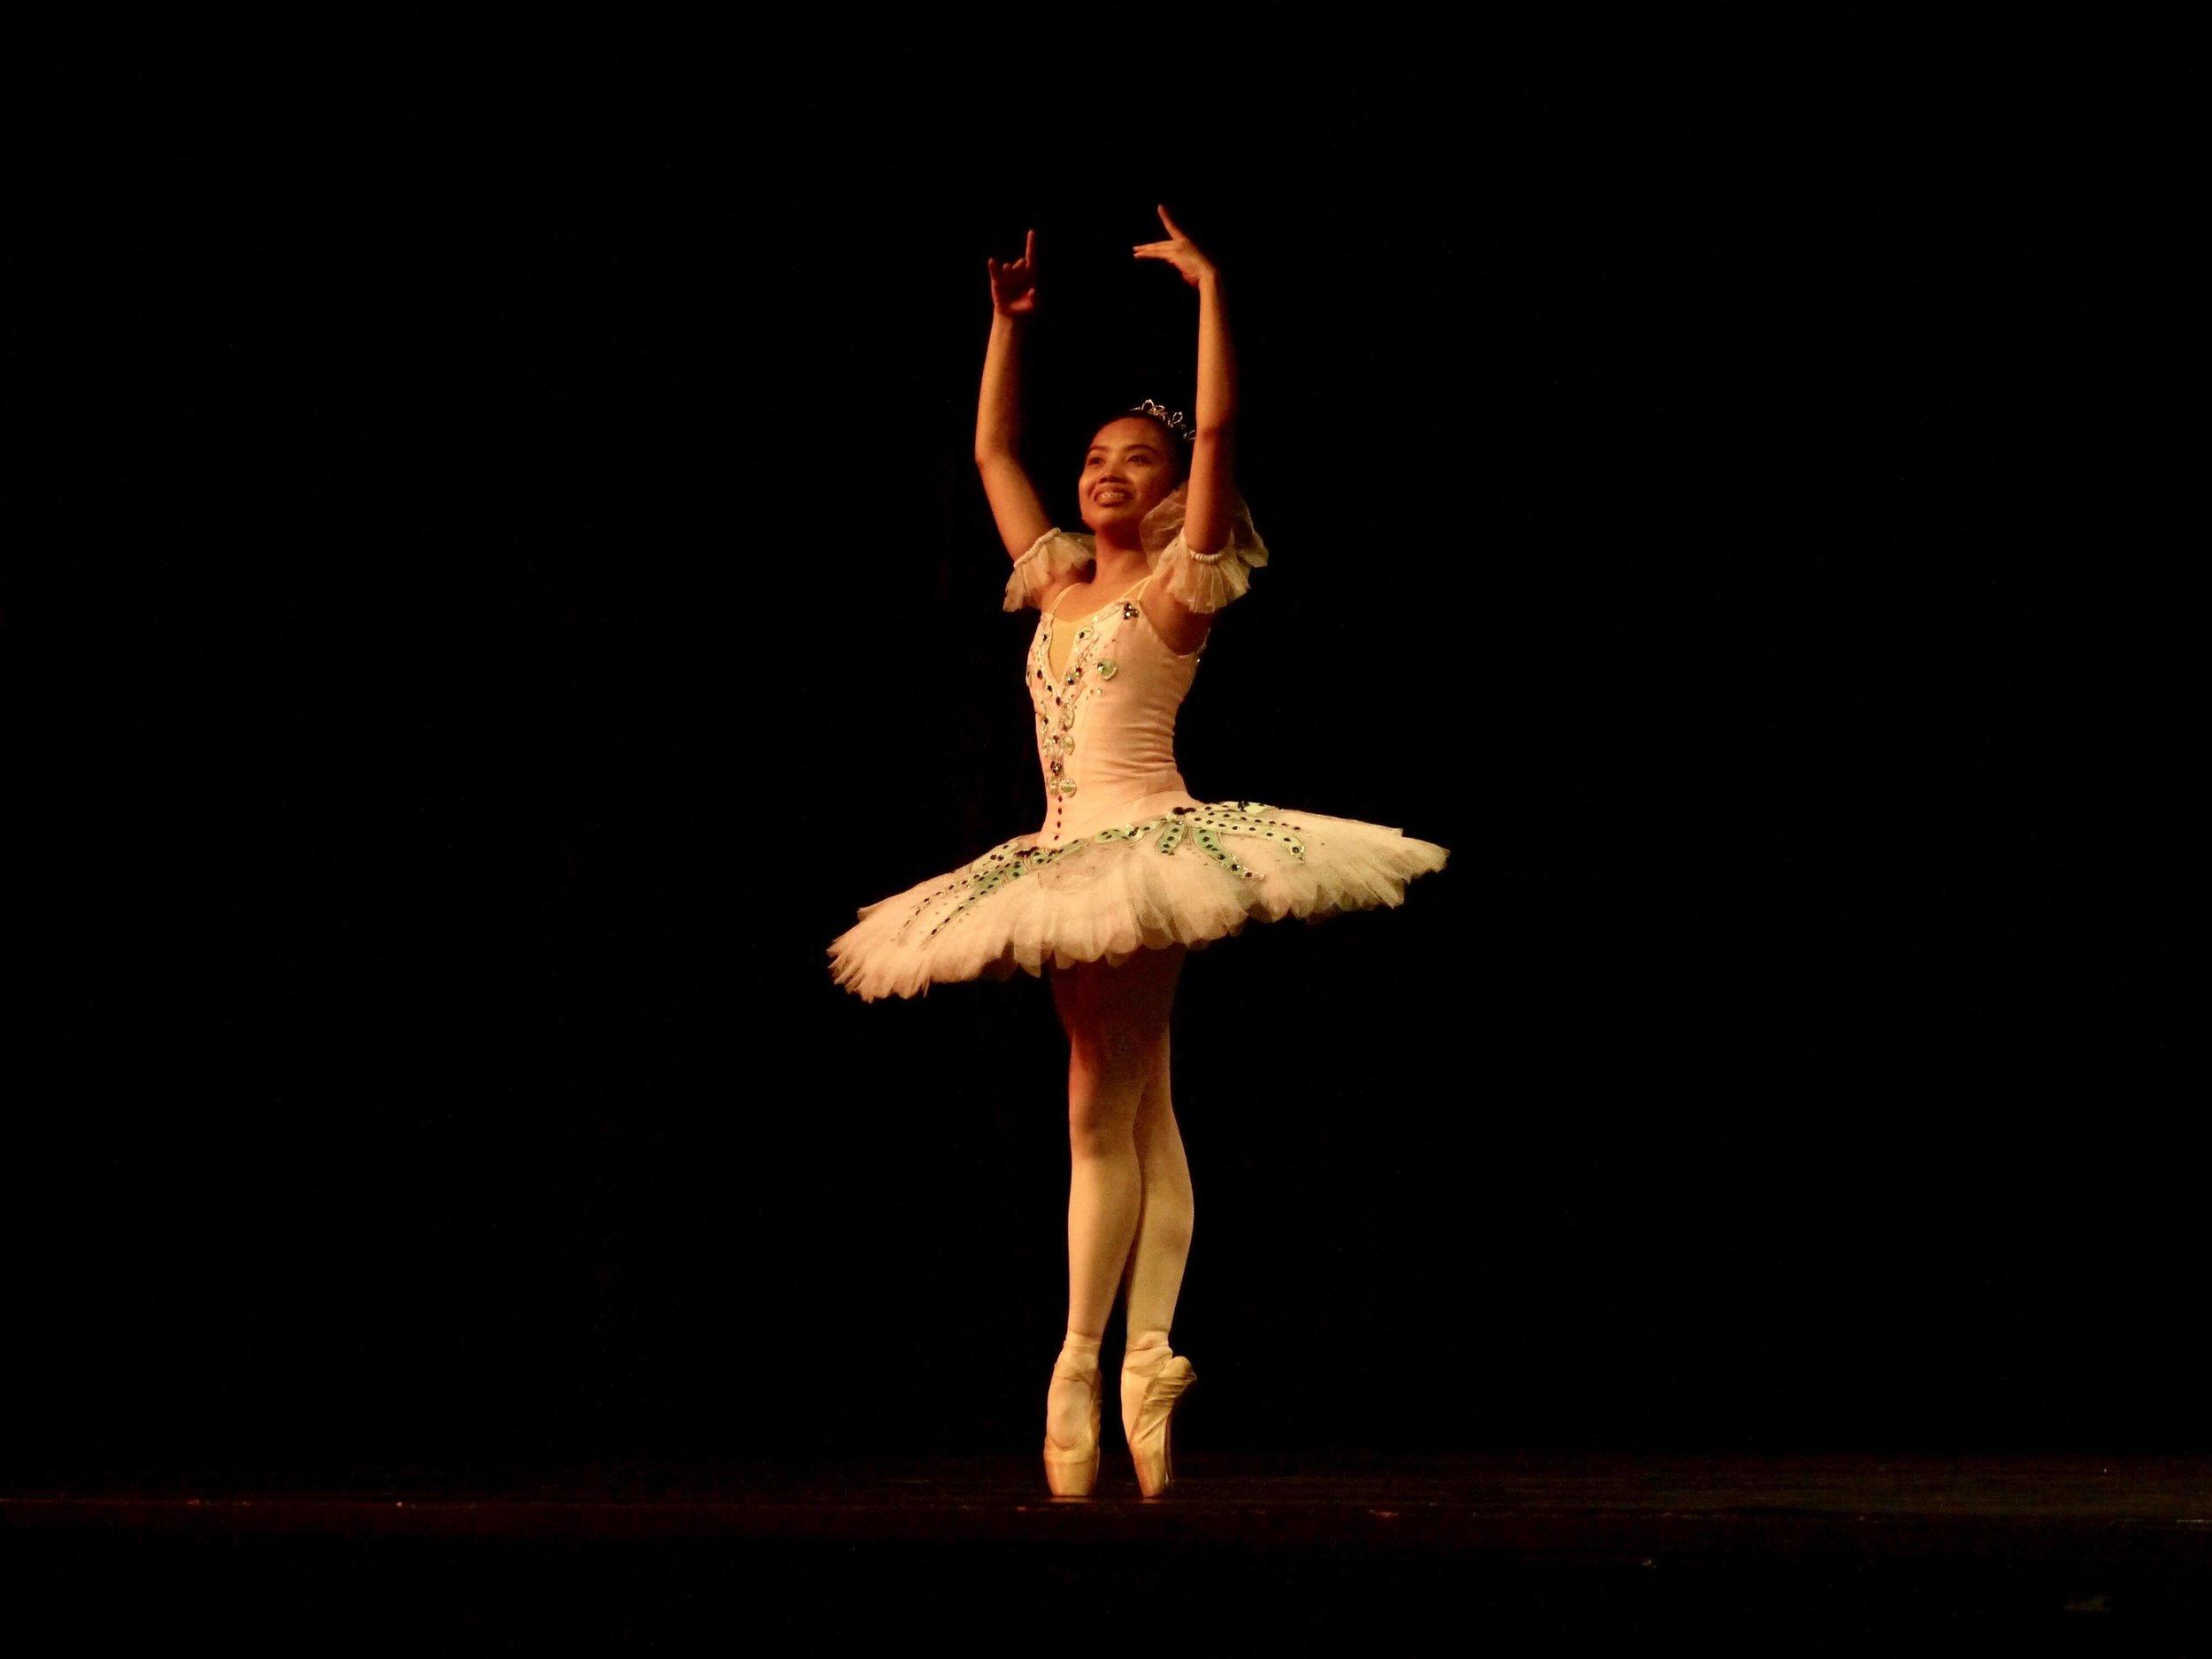 Elyssabeth Apilado – Junior B; Odalisque (Emboitee variation). Photo by Giselle P. Kasilag